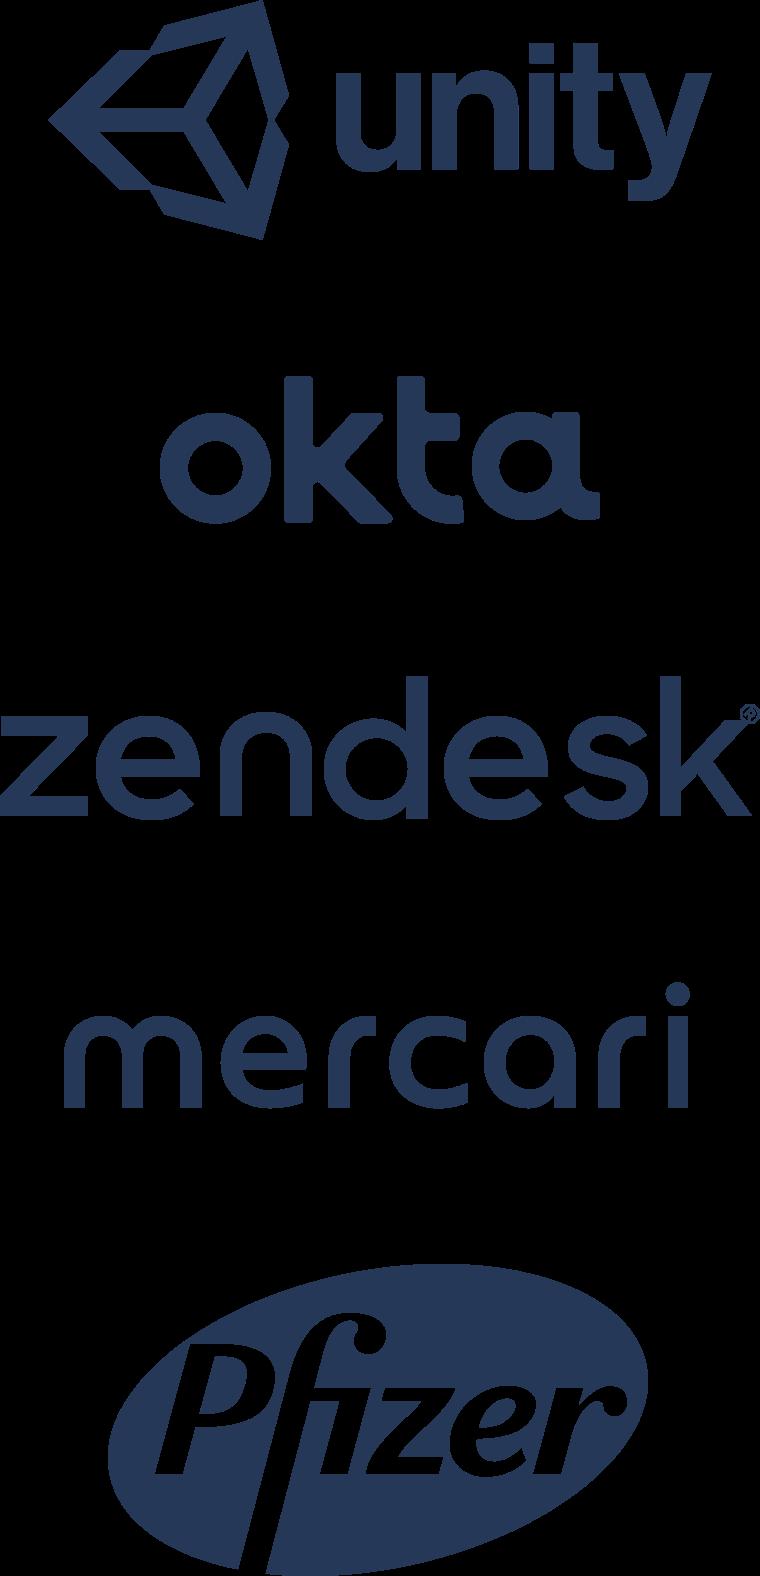 Logos Unity, Okta, Zendesk, Mercari et Pfizer